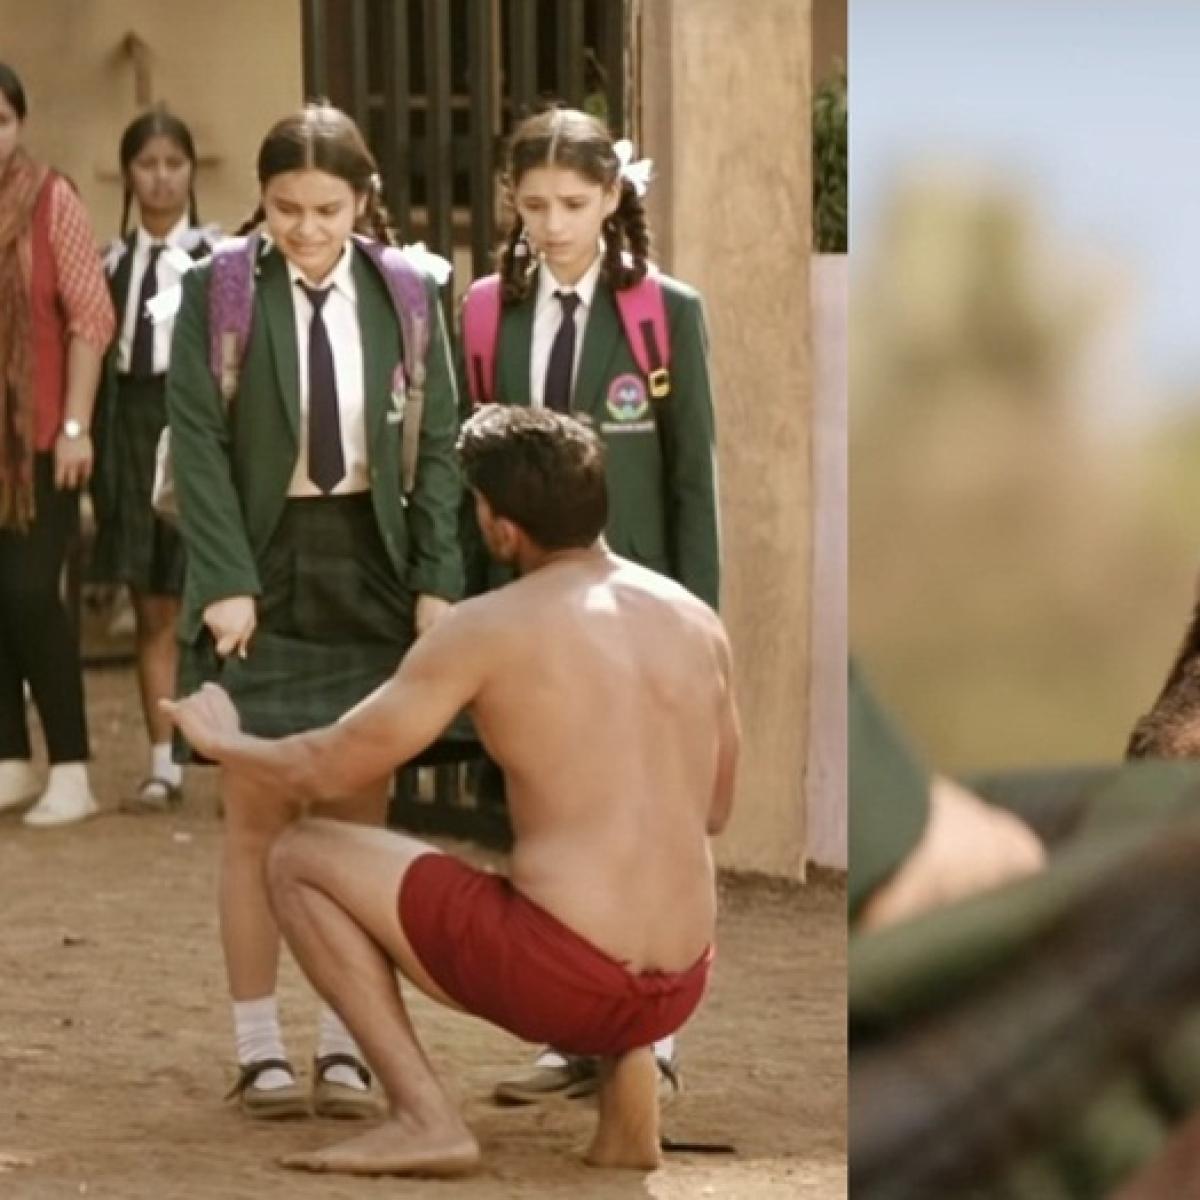 Commando 3: Paedophilic goon lifting schoolgirl's skirt in Vidyut Jammwal's movie draws flak